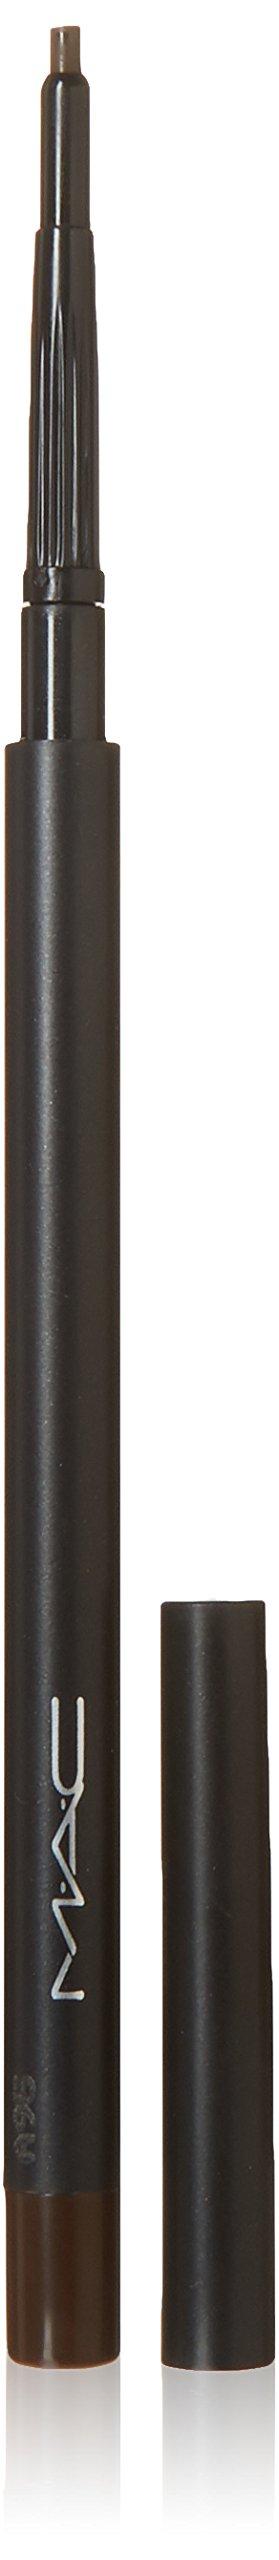 Amazon Mac Big Brow Pencil Spiked By Mac Beauty